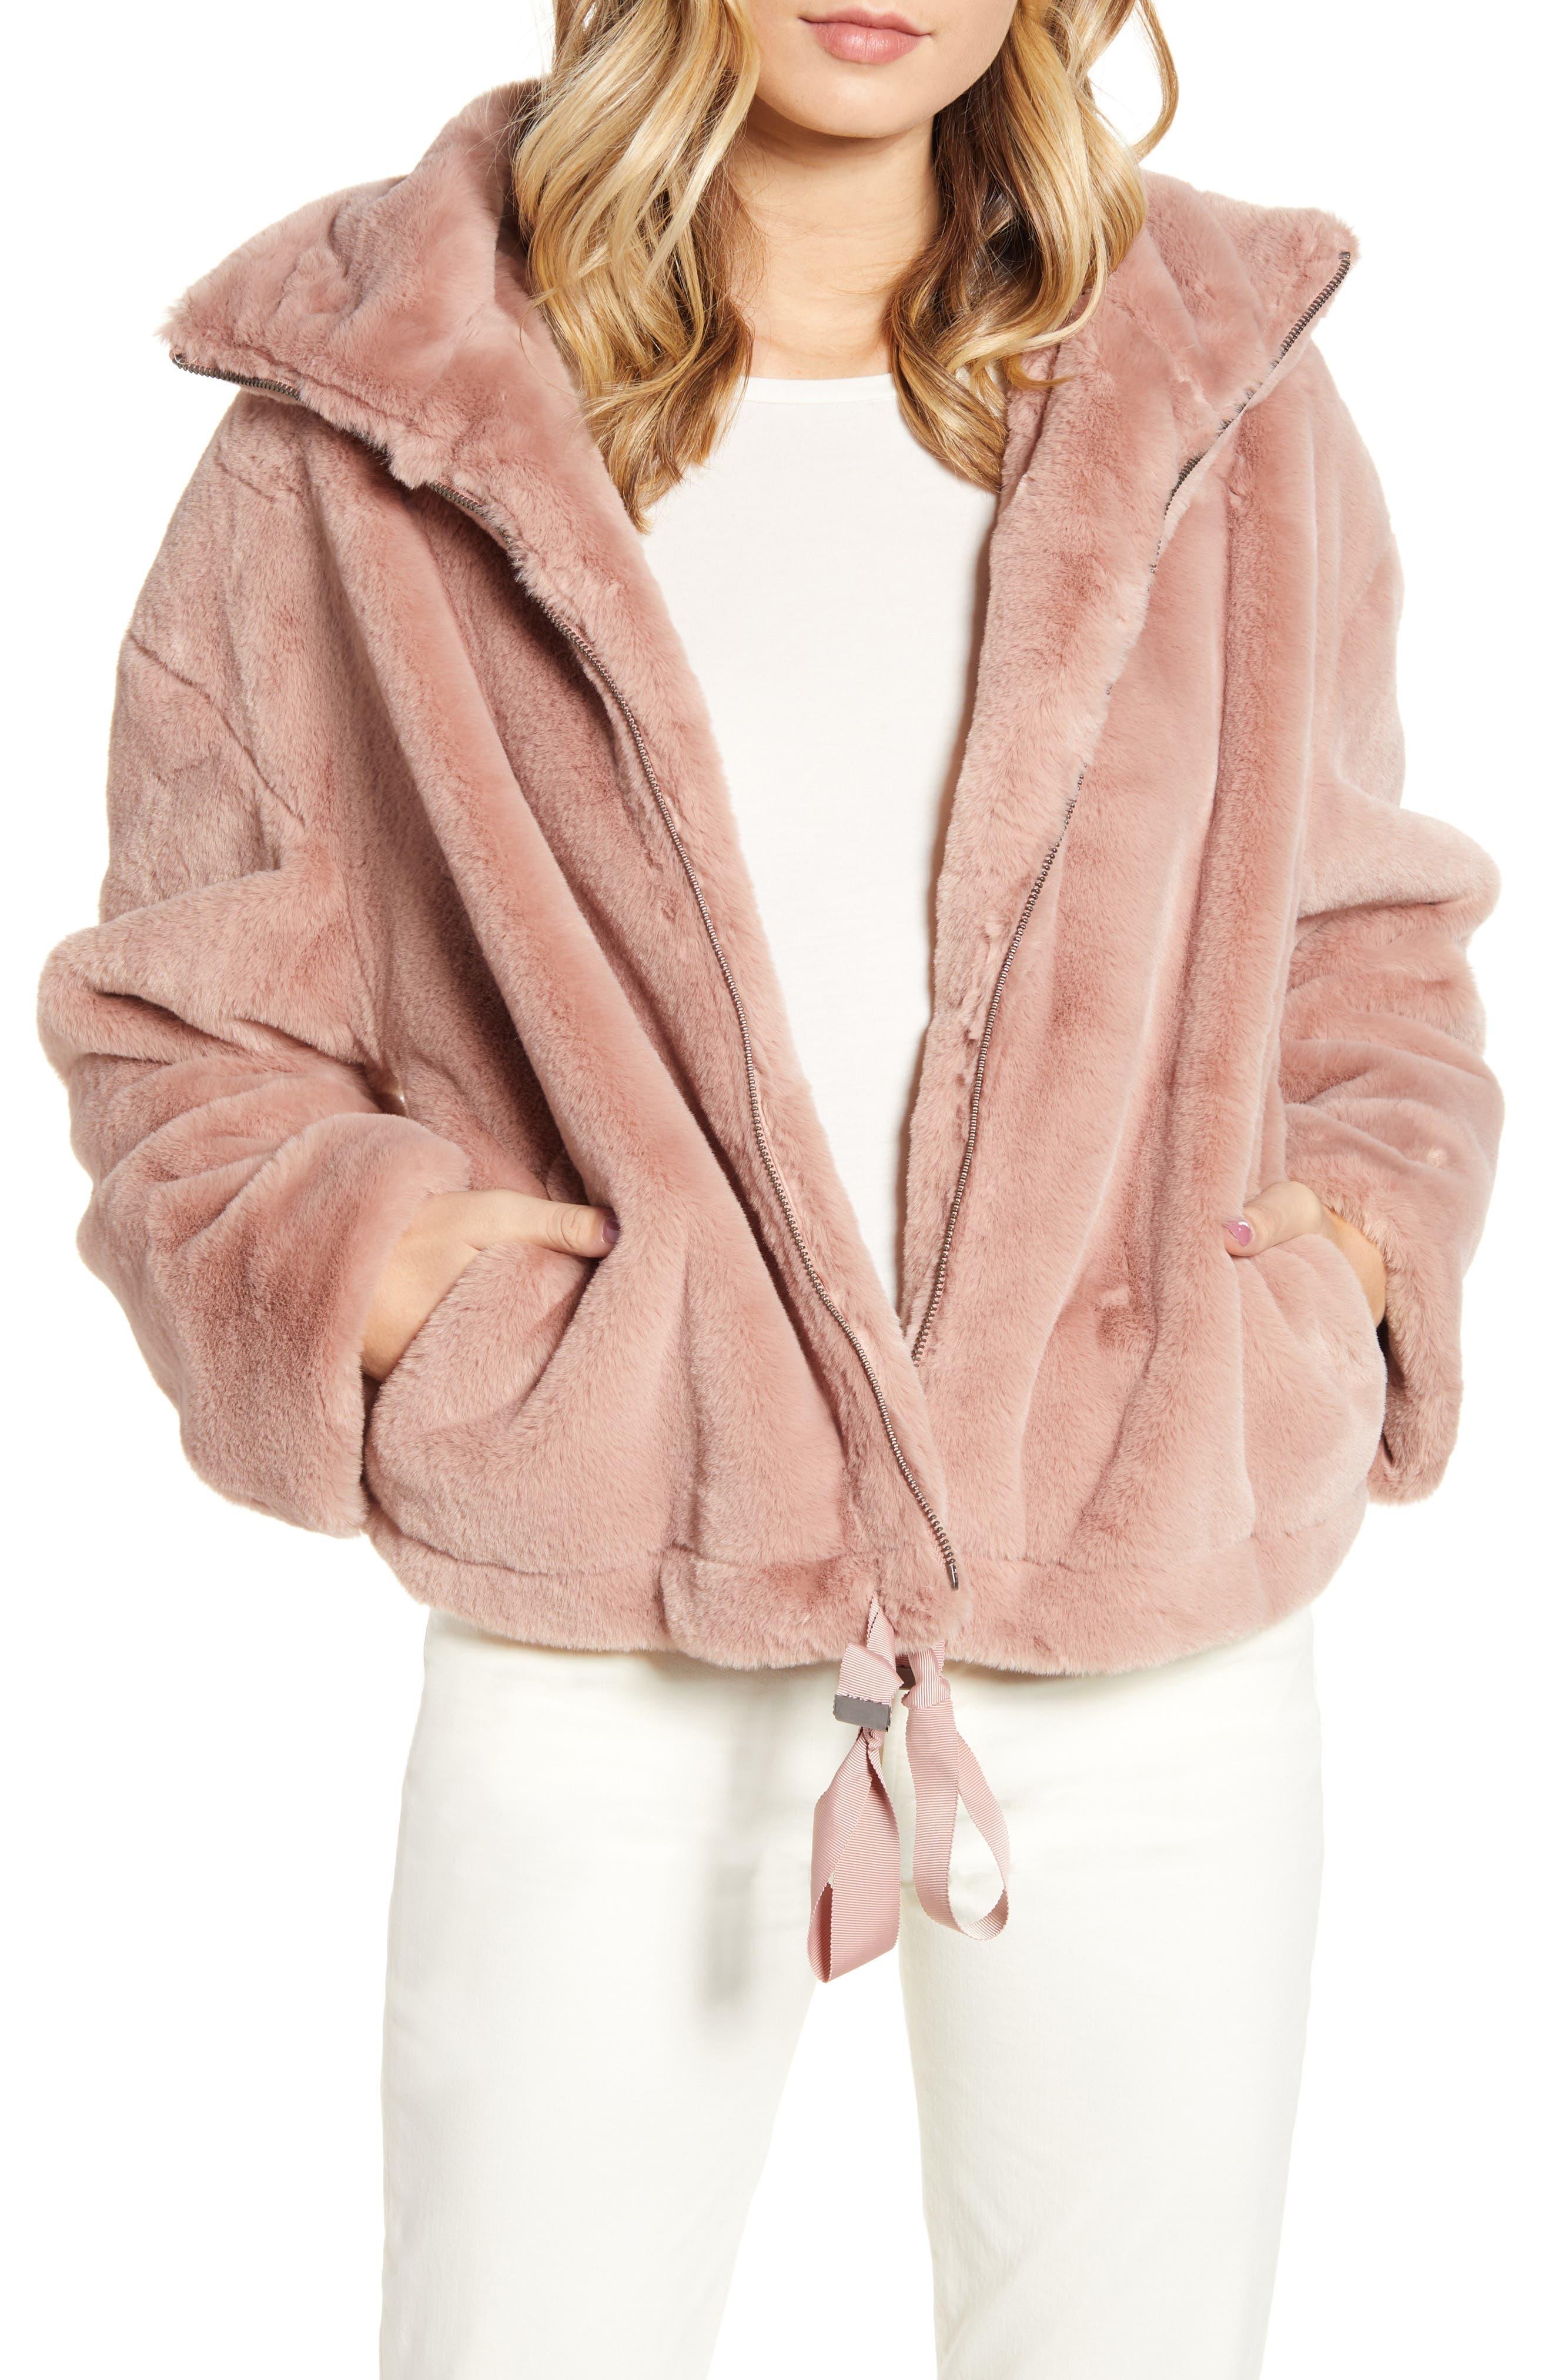 Rebecca Minkoff Faux Fur Bomber Jacket